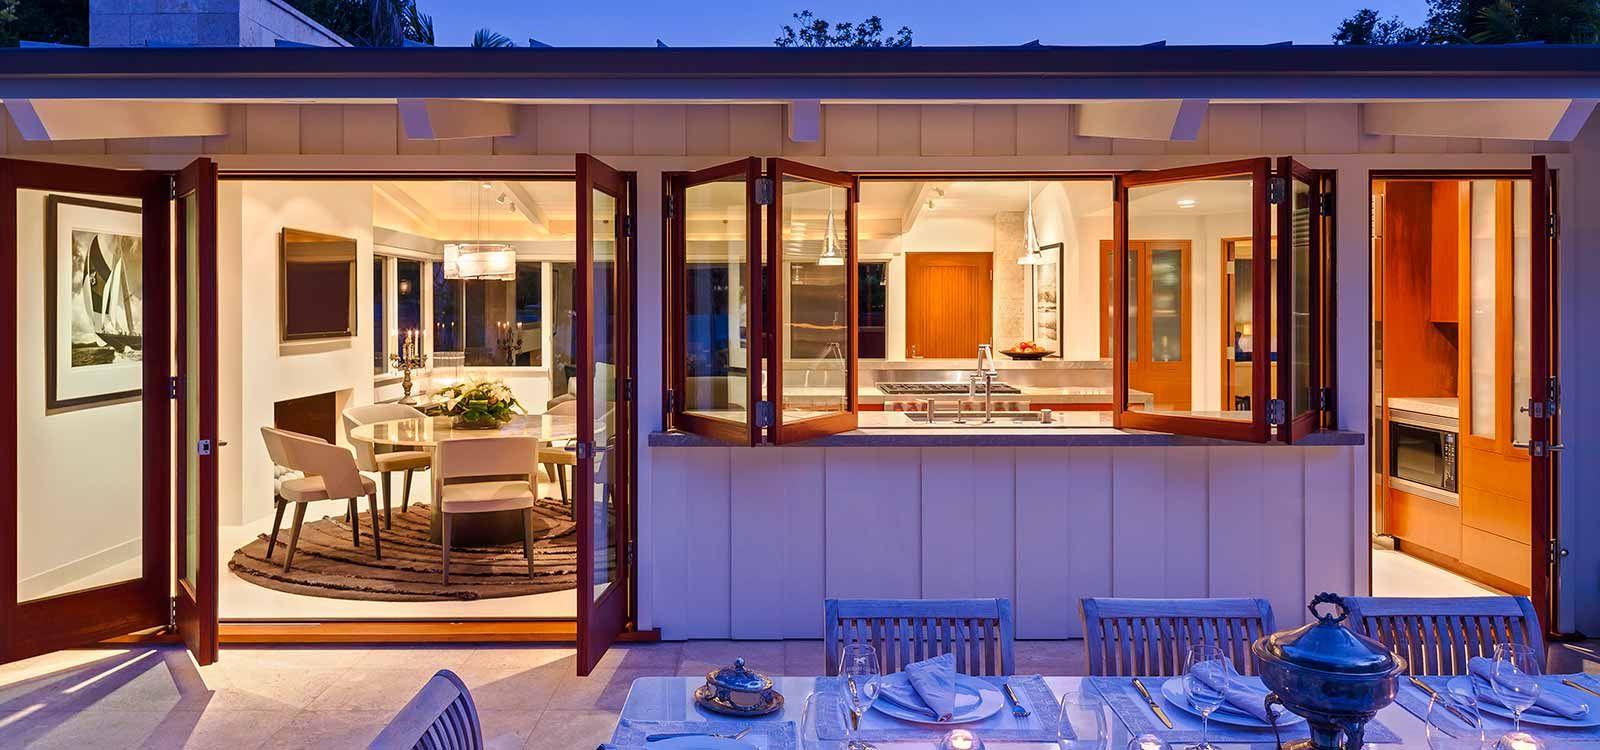 Desain Rumah Bergaya Villa